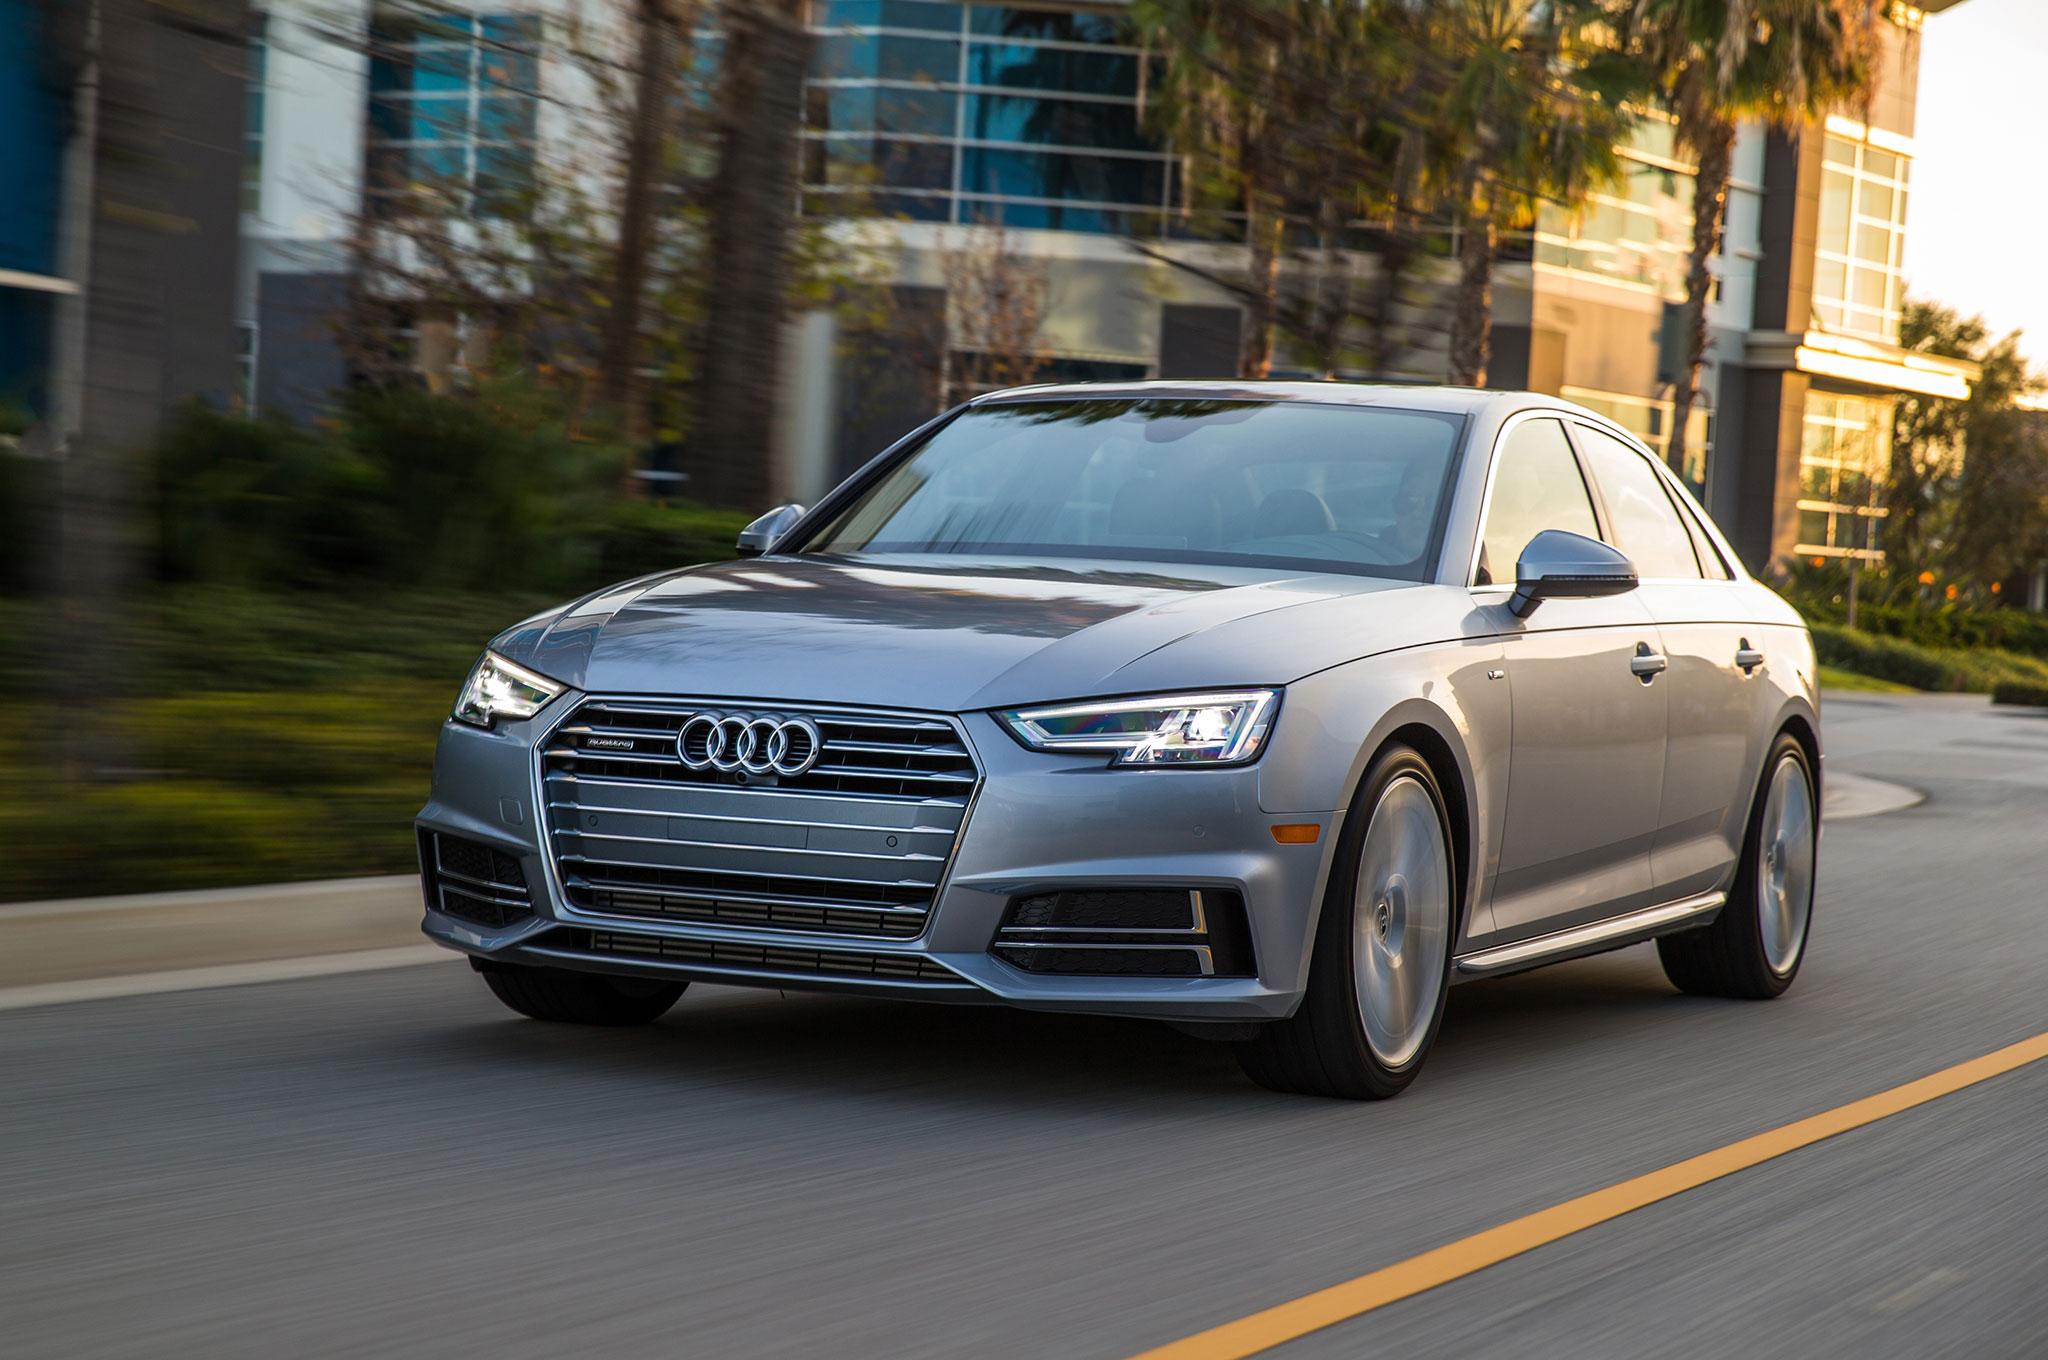 2017 jaguar xj review redesign price 2017 2018 car reviews - Cars Audi A4 20 T 2017 Audi A4 2 0t Tfsi Quattro Review